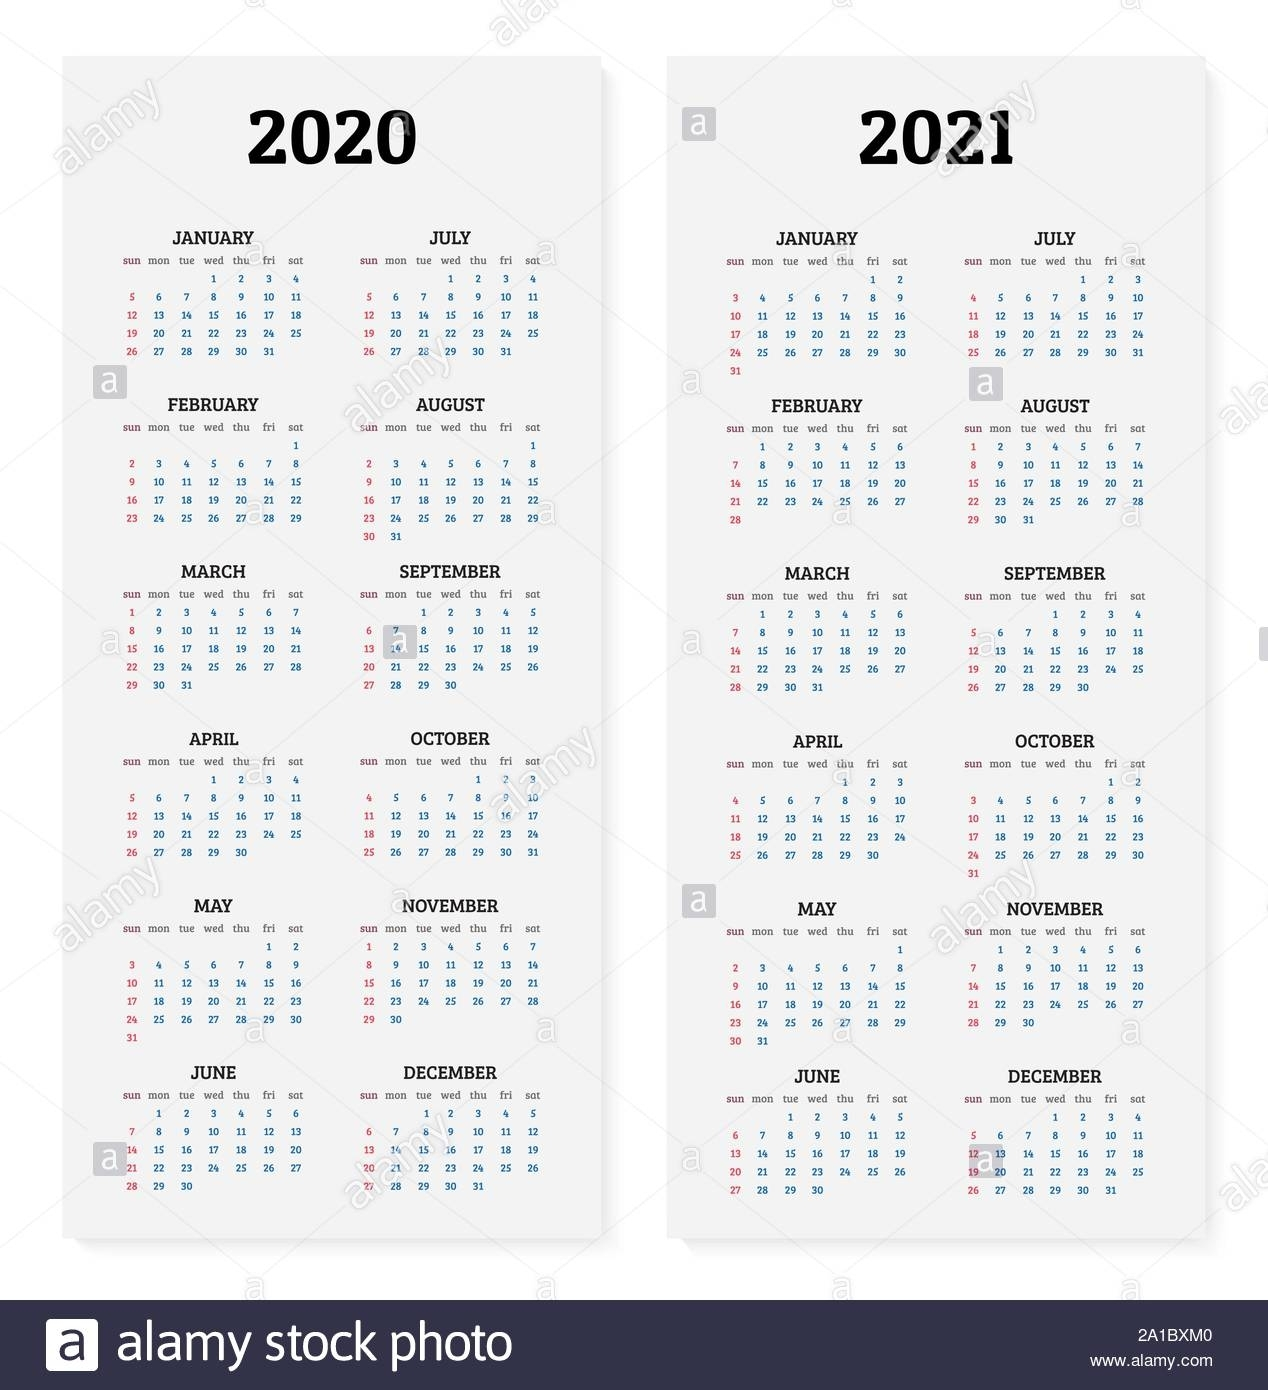 2020 And 2021 Annual Calendar Vector Illustration Stock